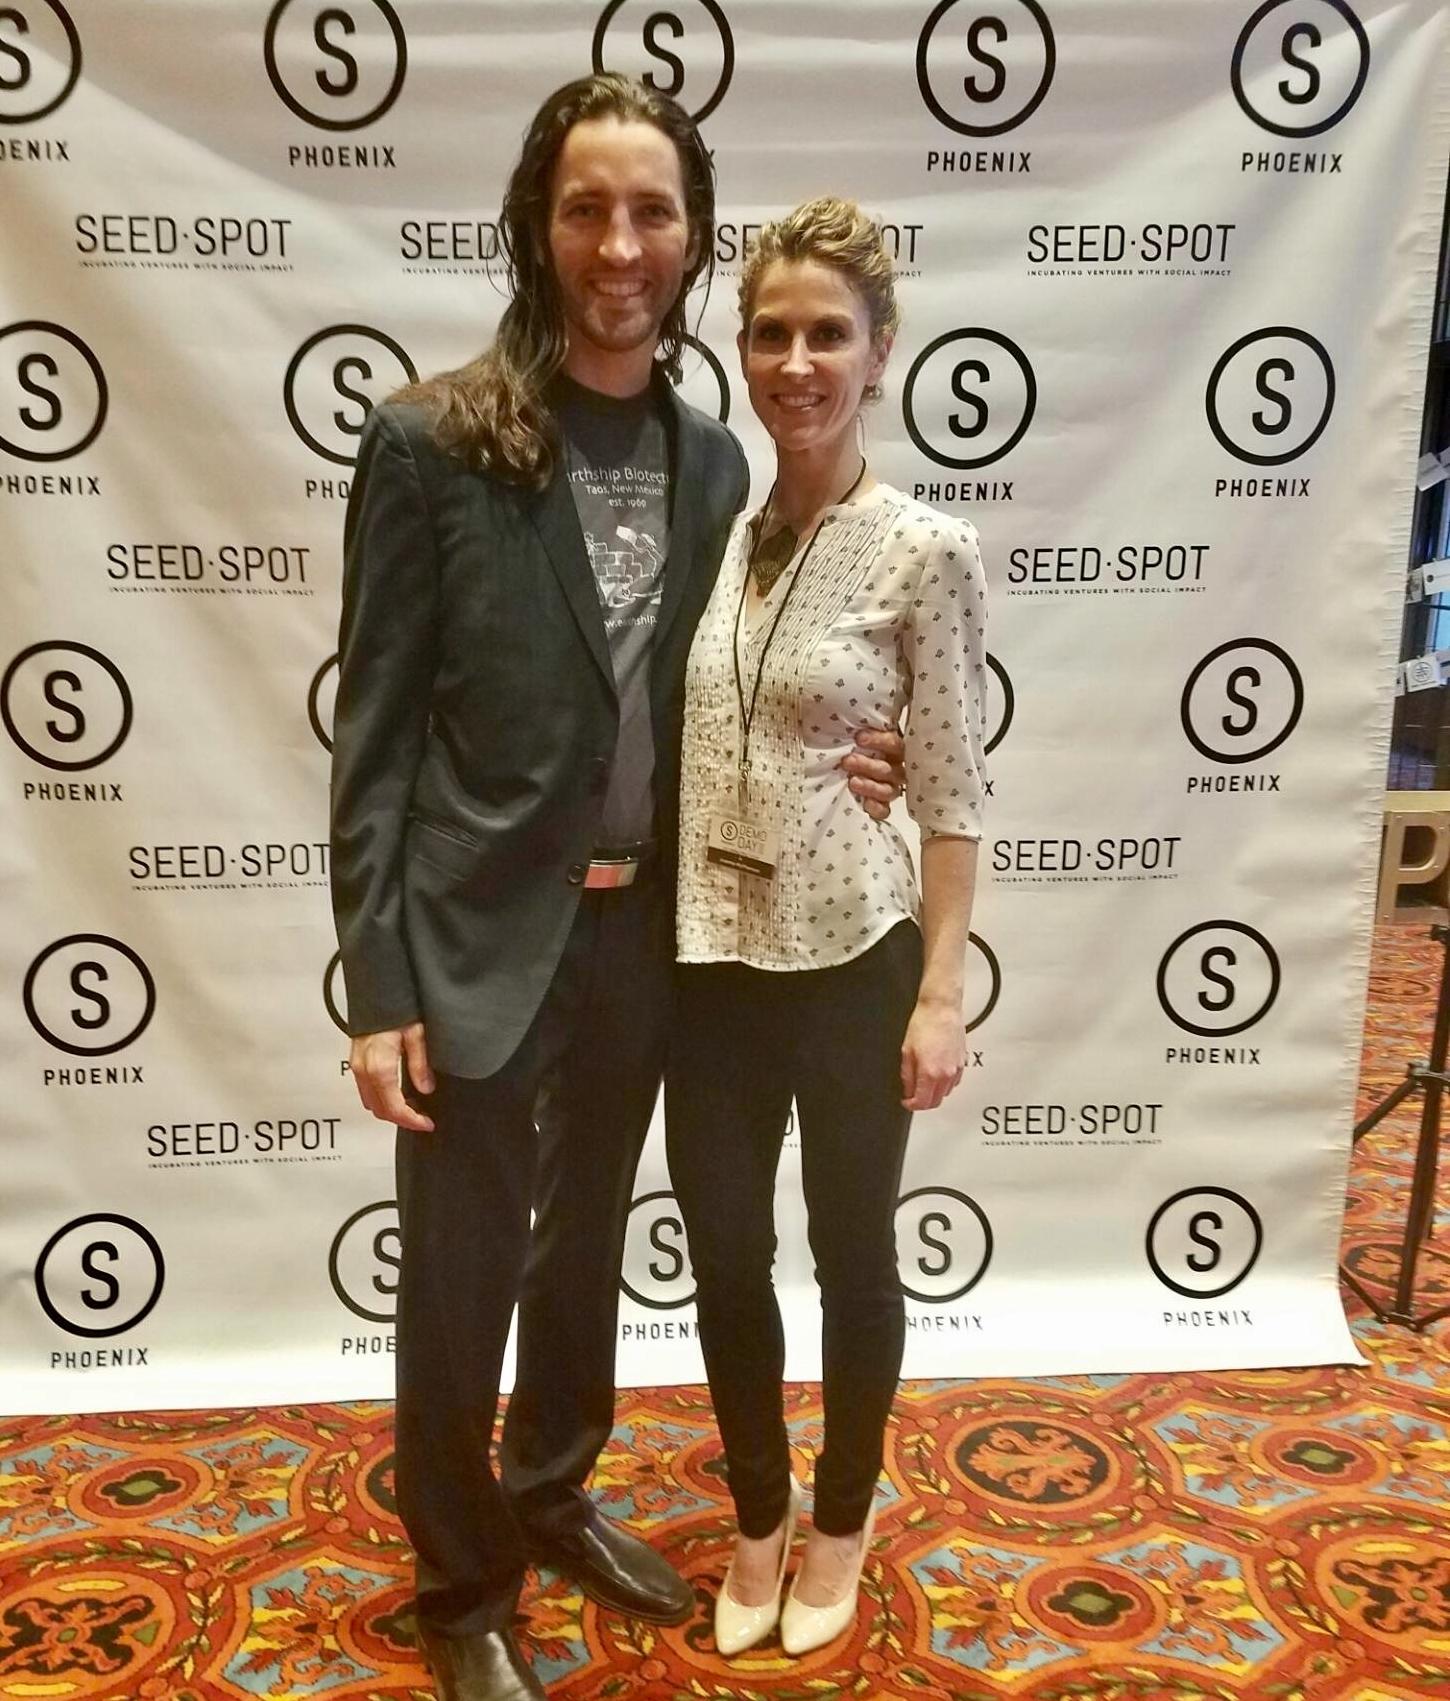 J&T SeedSpot